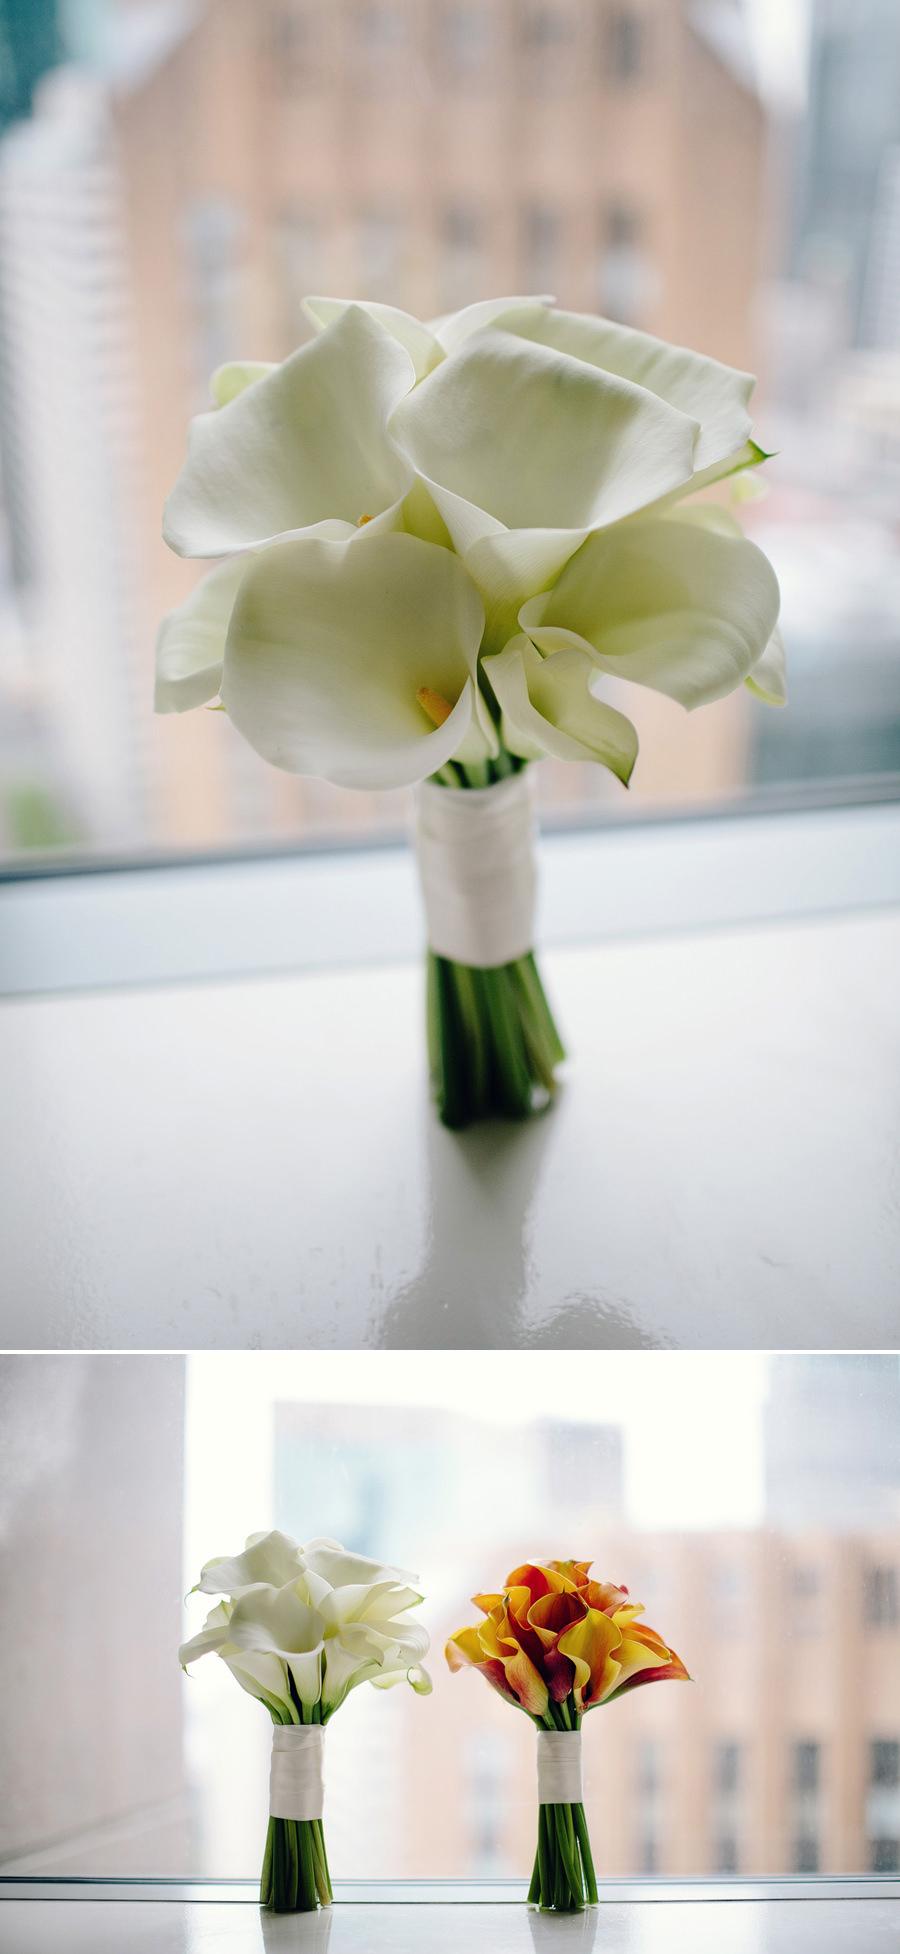 Sydney Wedding Photography: Bouquets